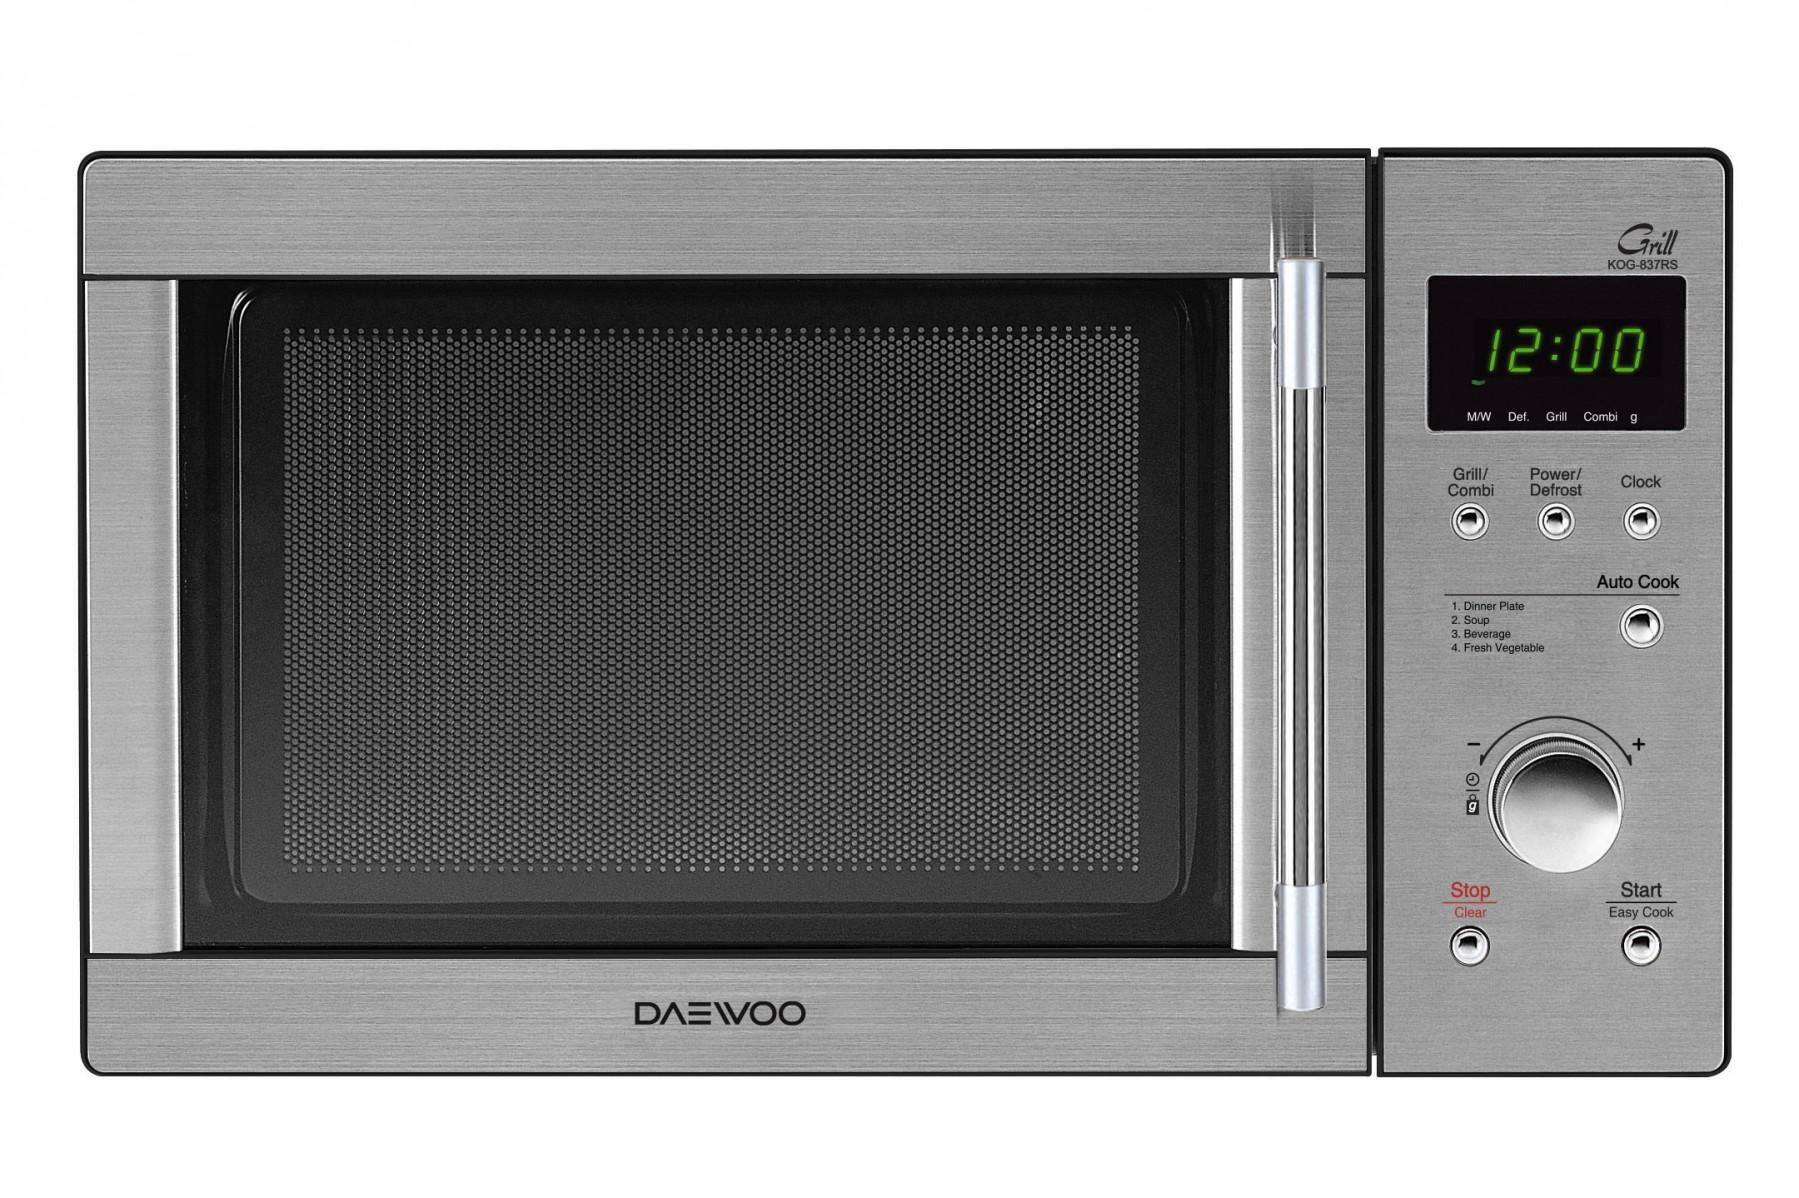 Daewoo KOG-837RS